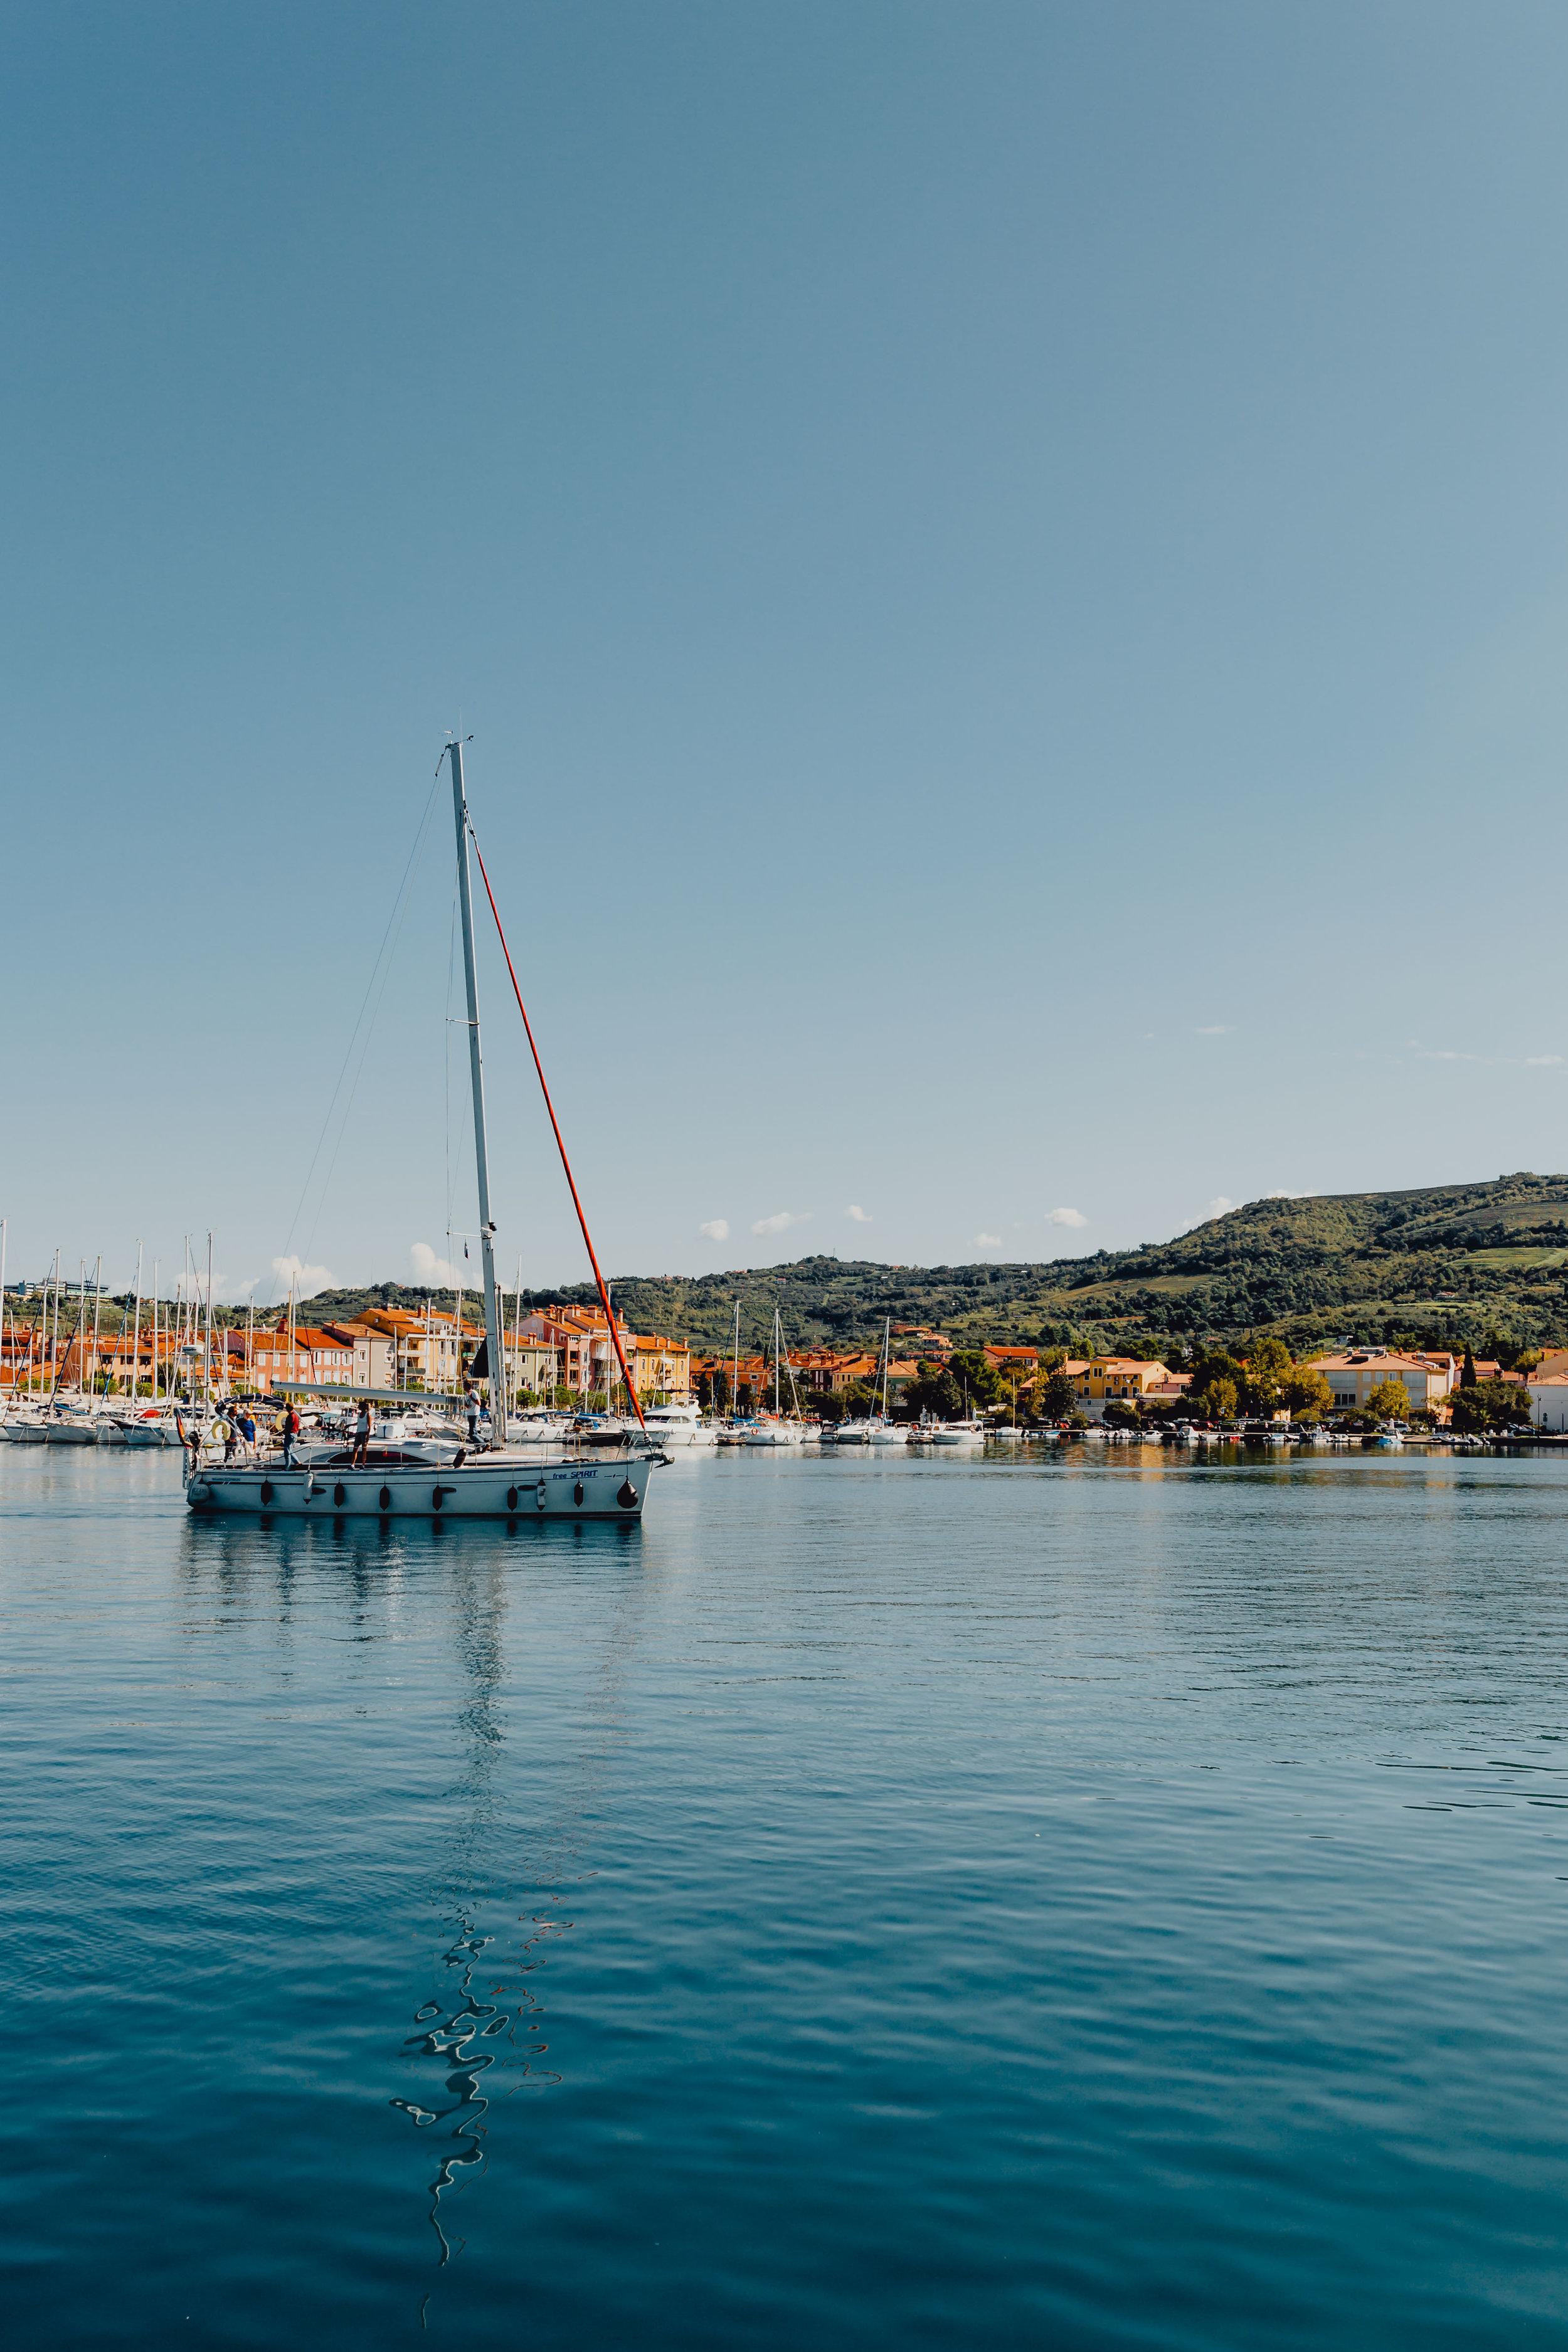 kaboompics_Beautiful coast town Izola, Slovenia.jpg